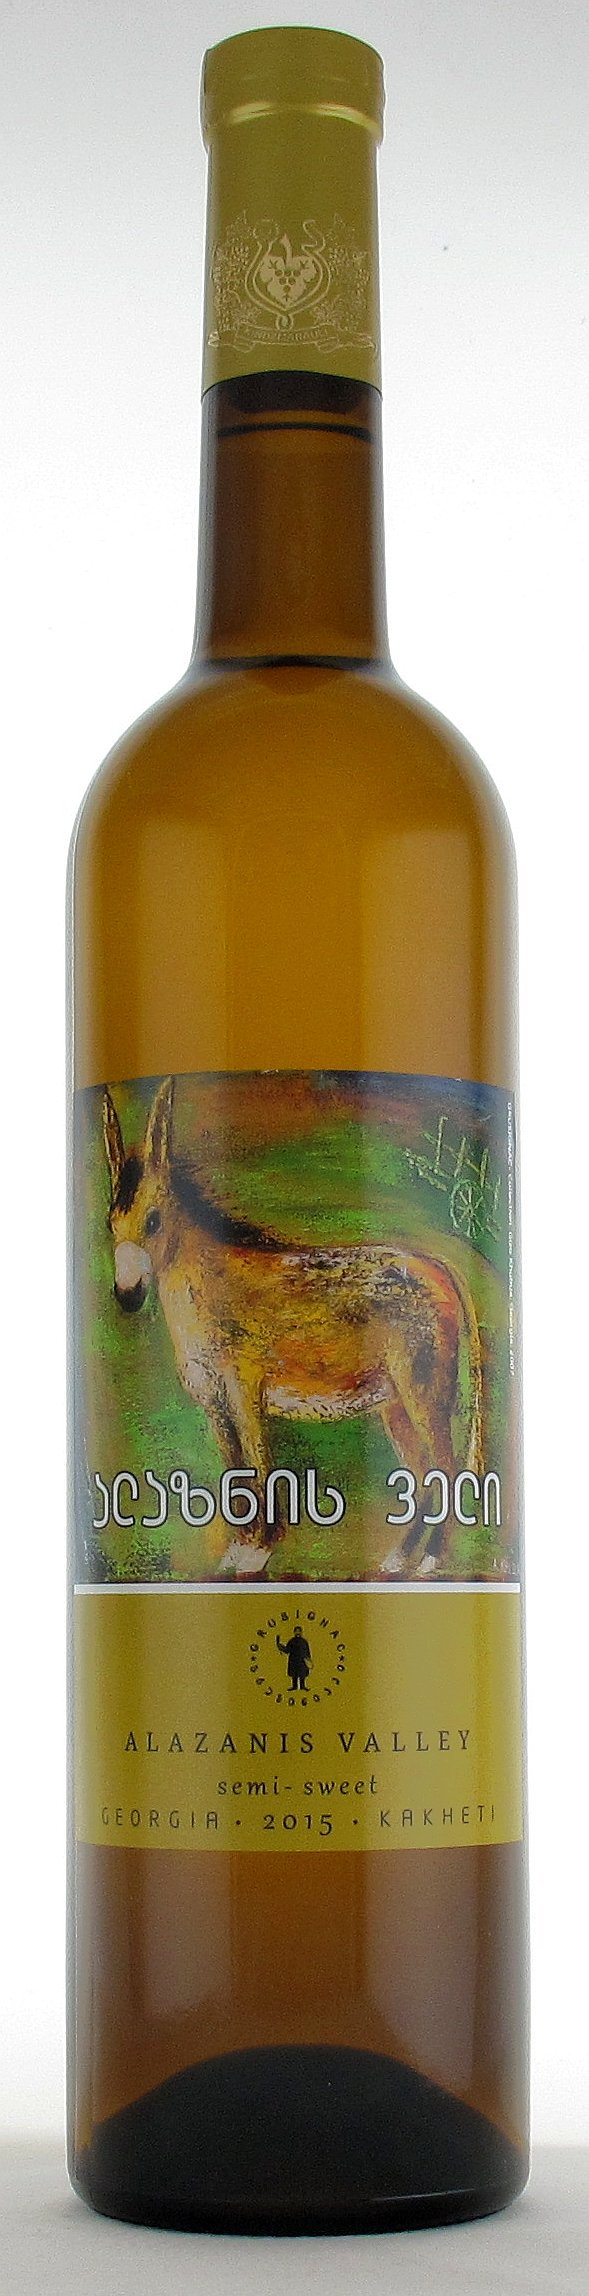 Georgischer-Wein-ALAZANIS-VALLEY-wei-halbs-aus-autochthone-Rebsorte-Rkatsiteli-075L-Georgien